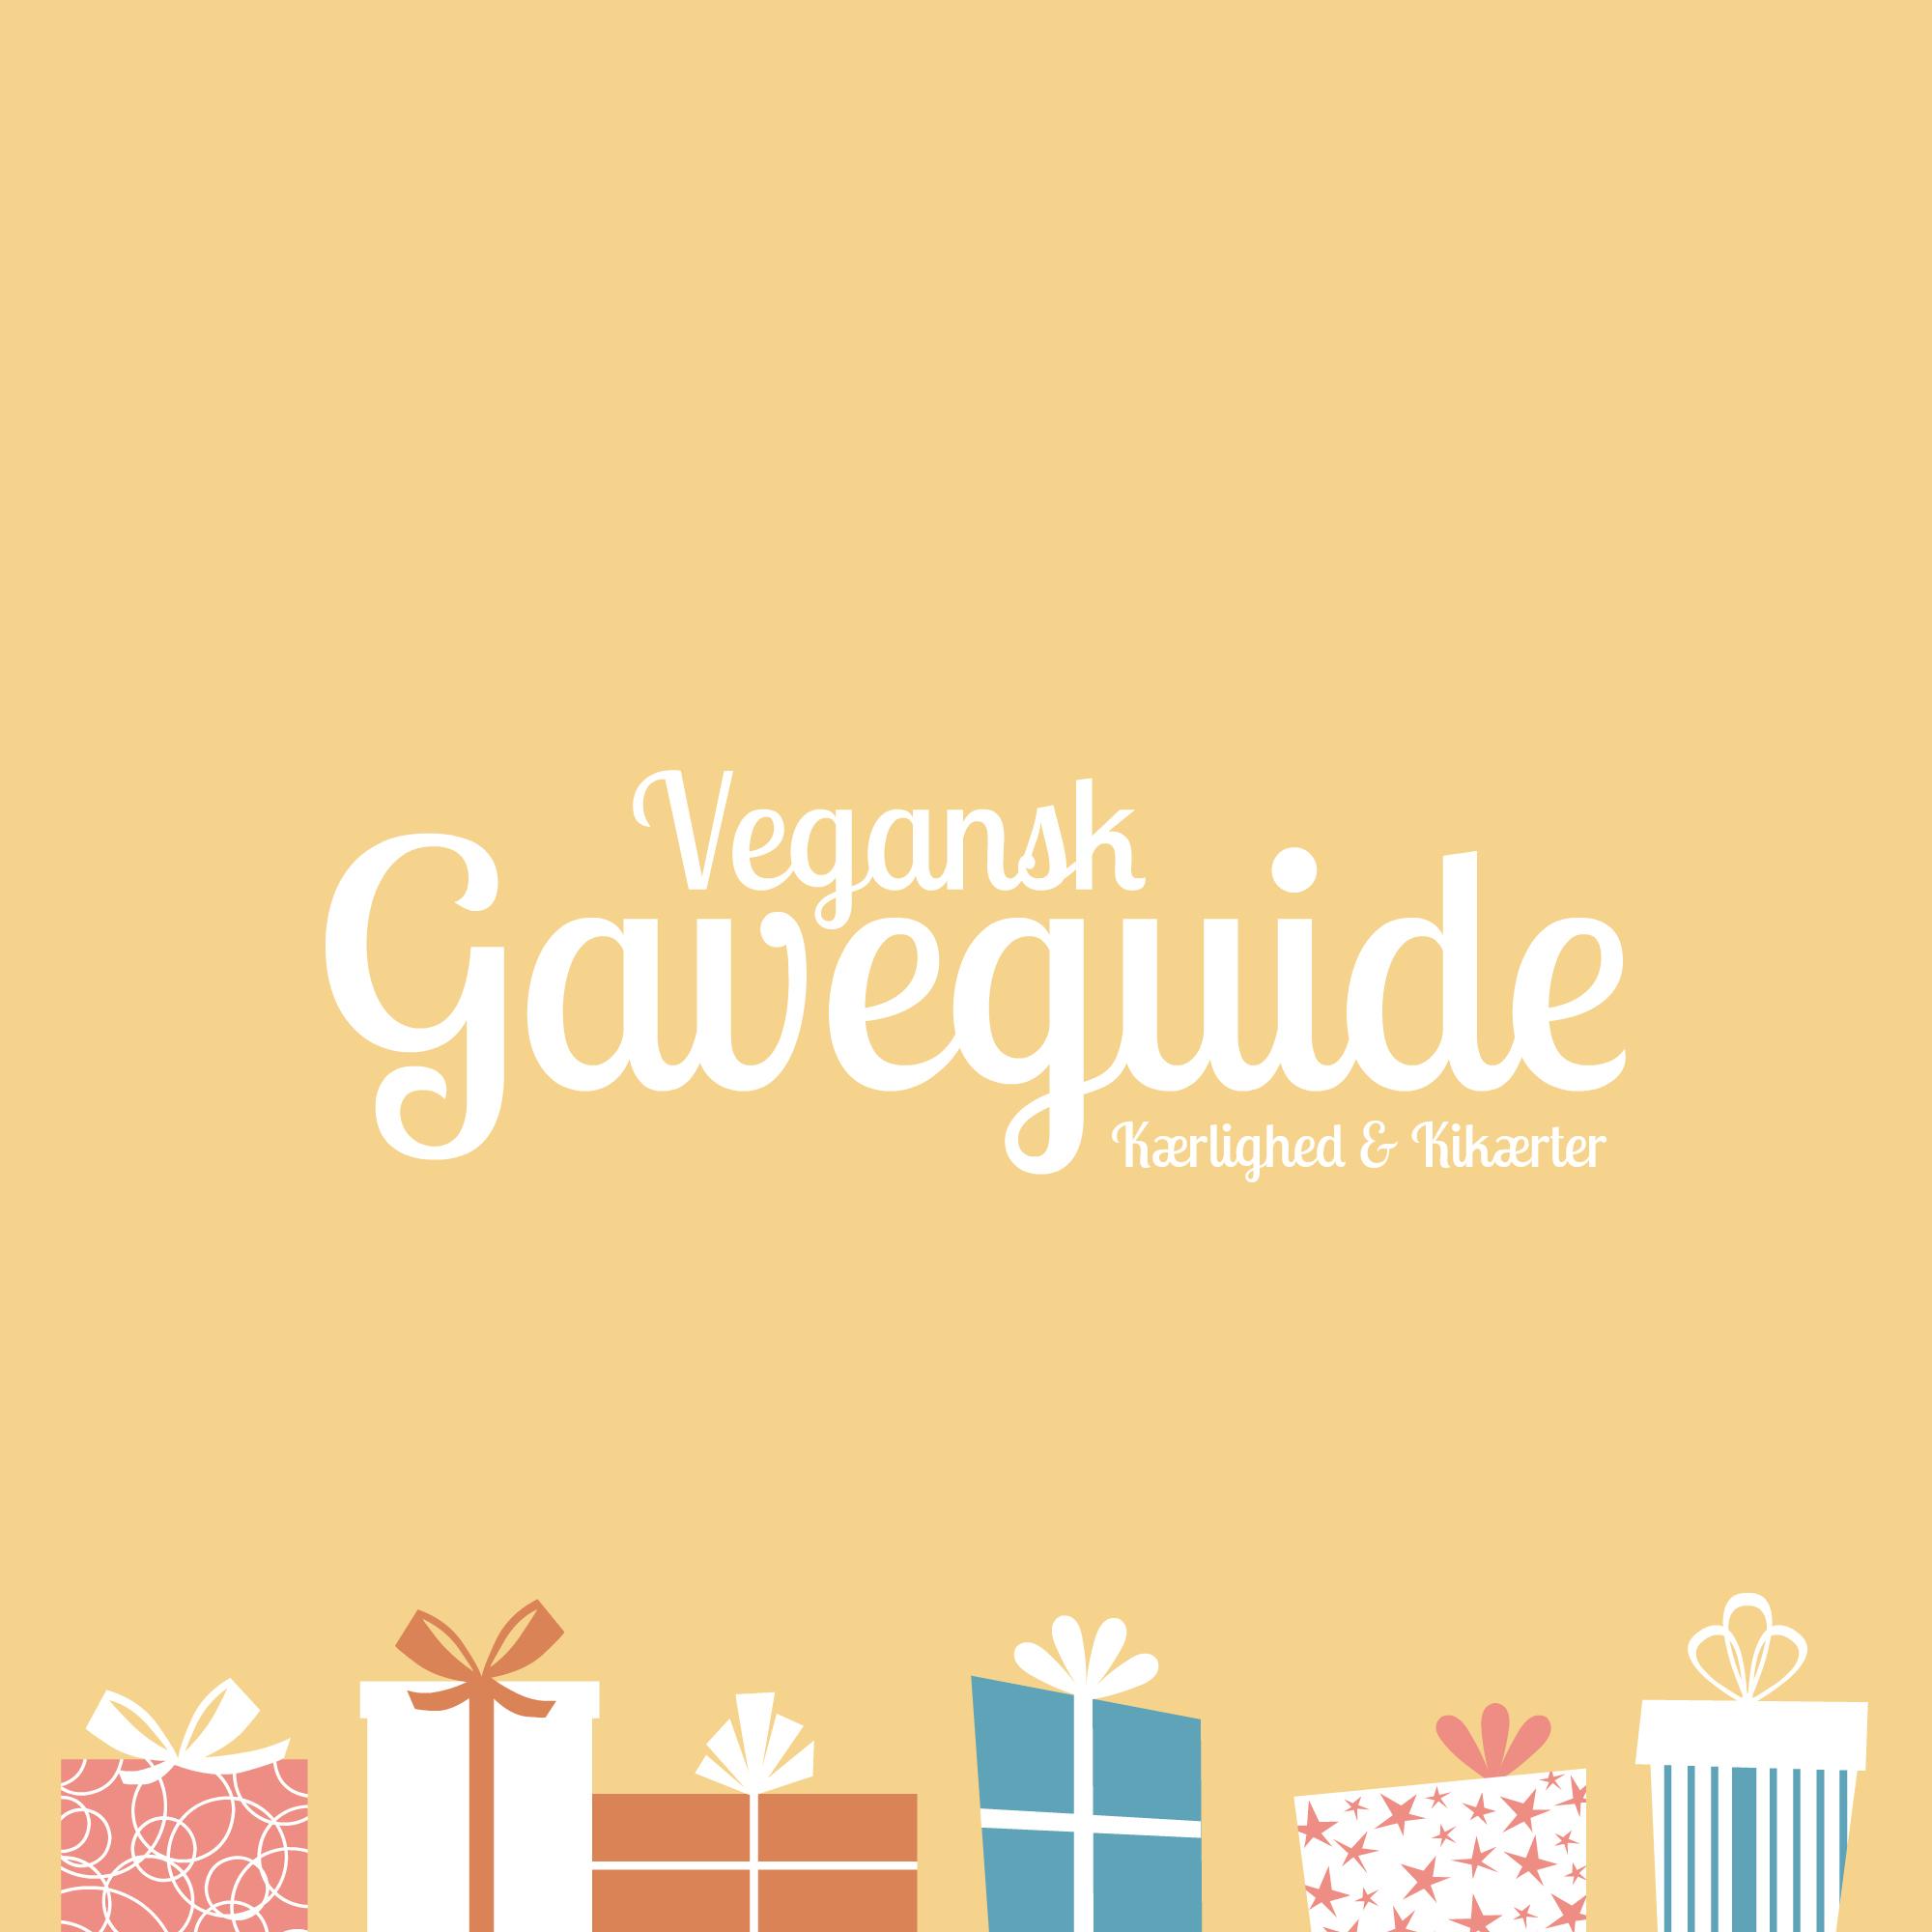 gaveguide